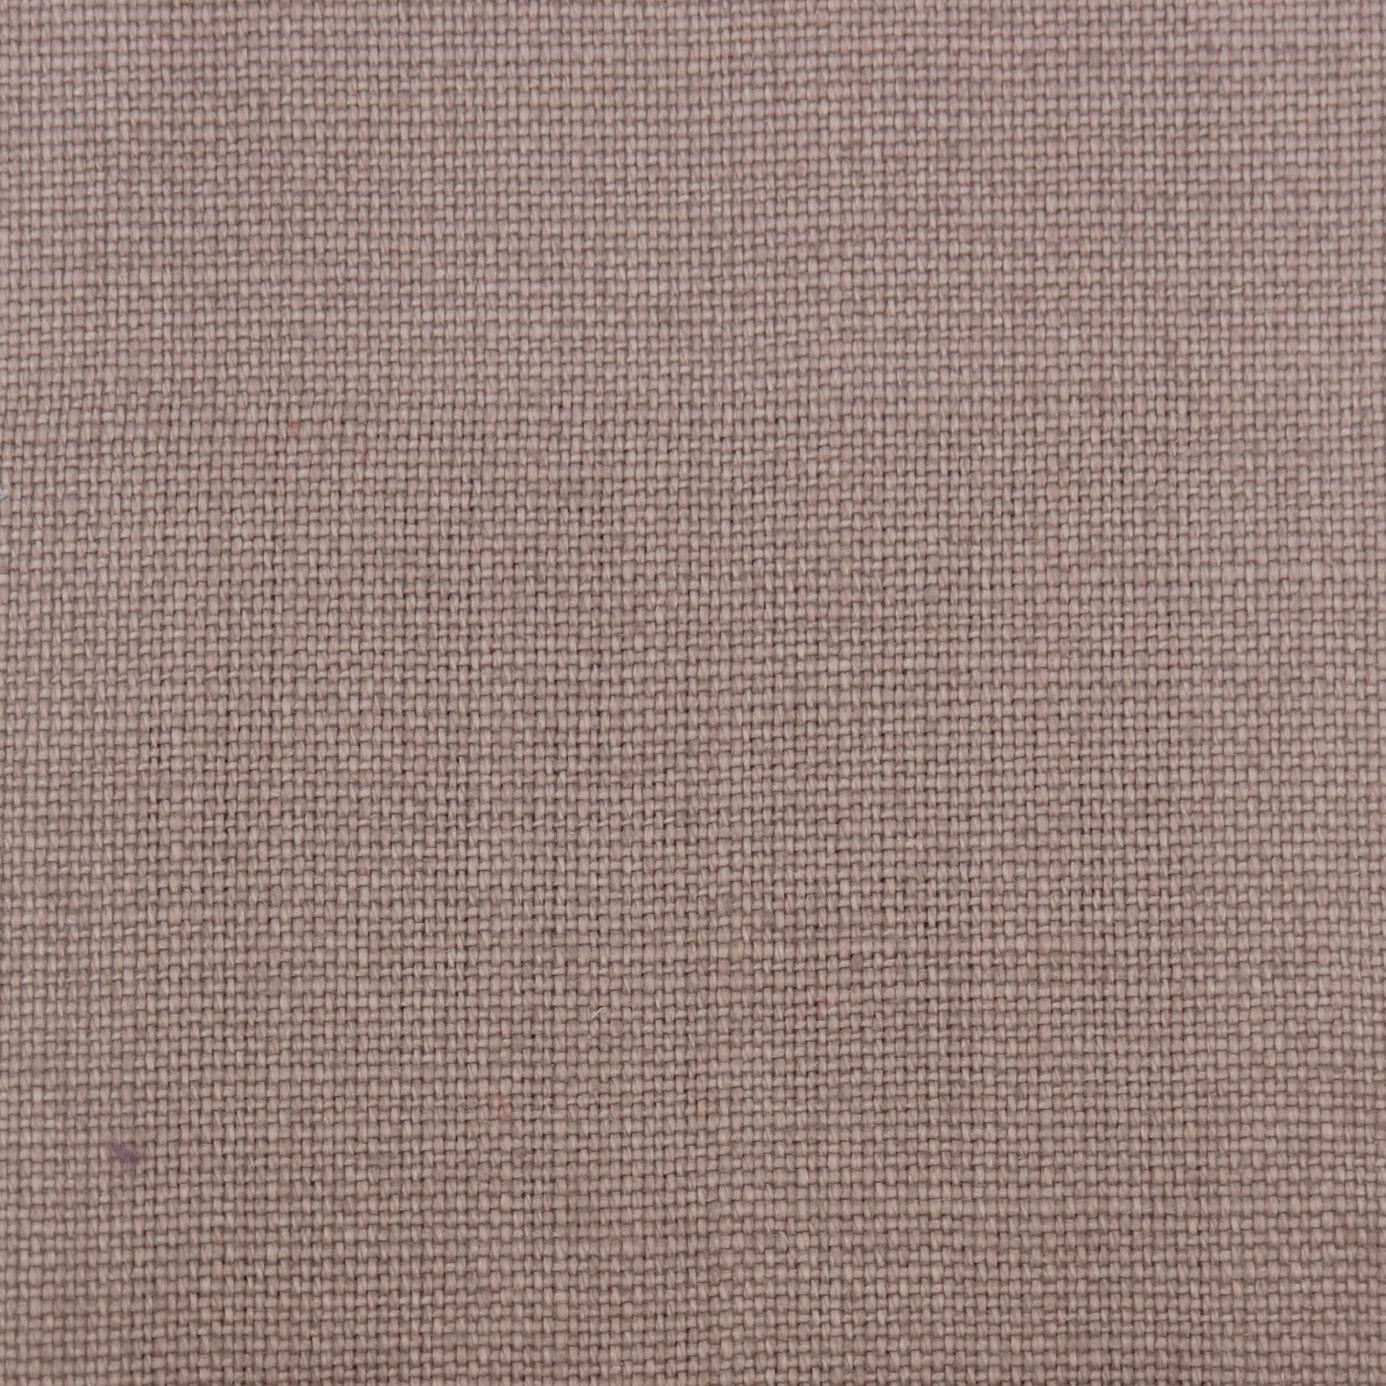 Slubby linen fabric amethyst slubby linen amethyst for Linen fabric